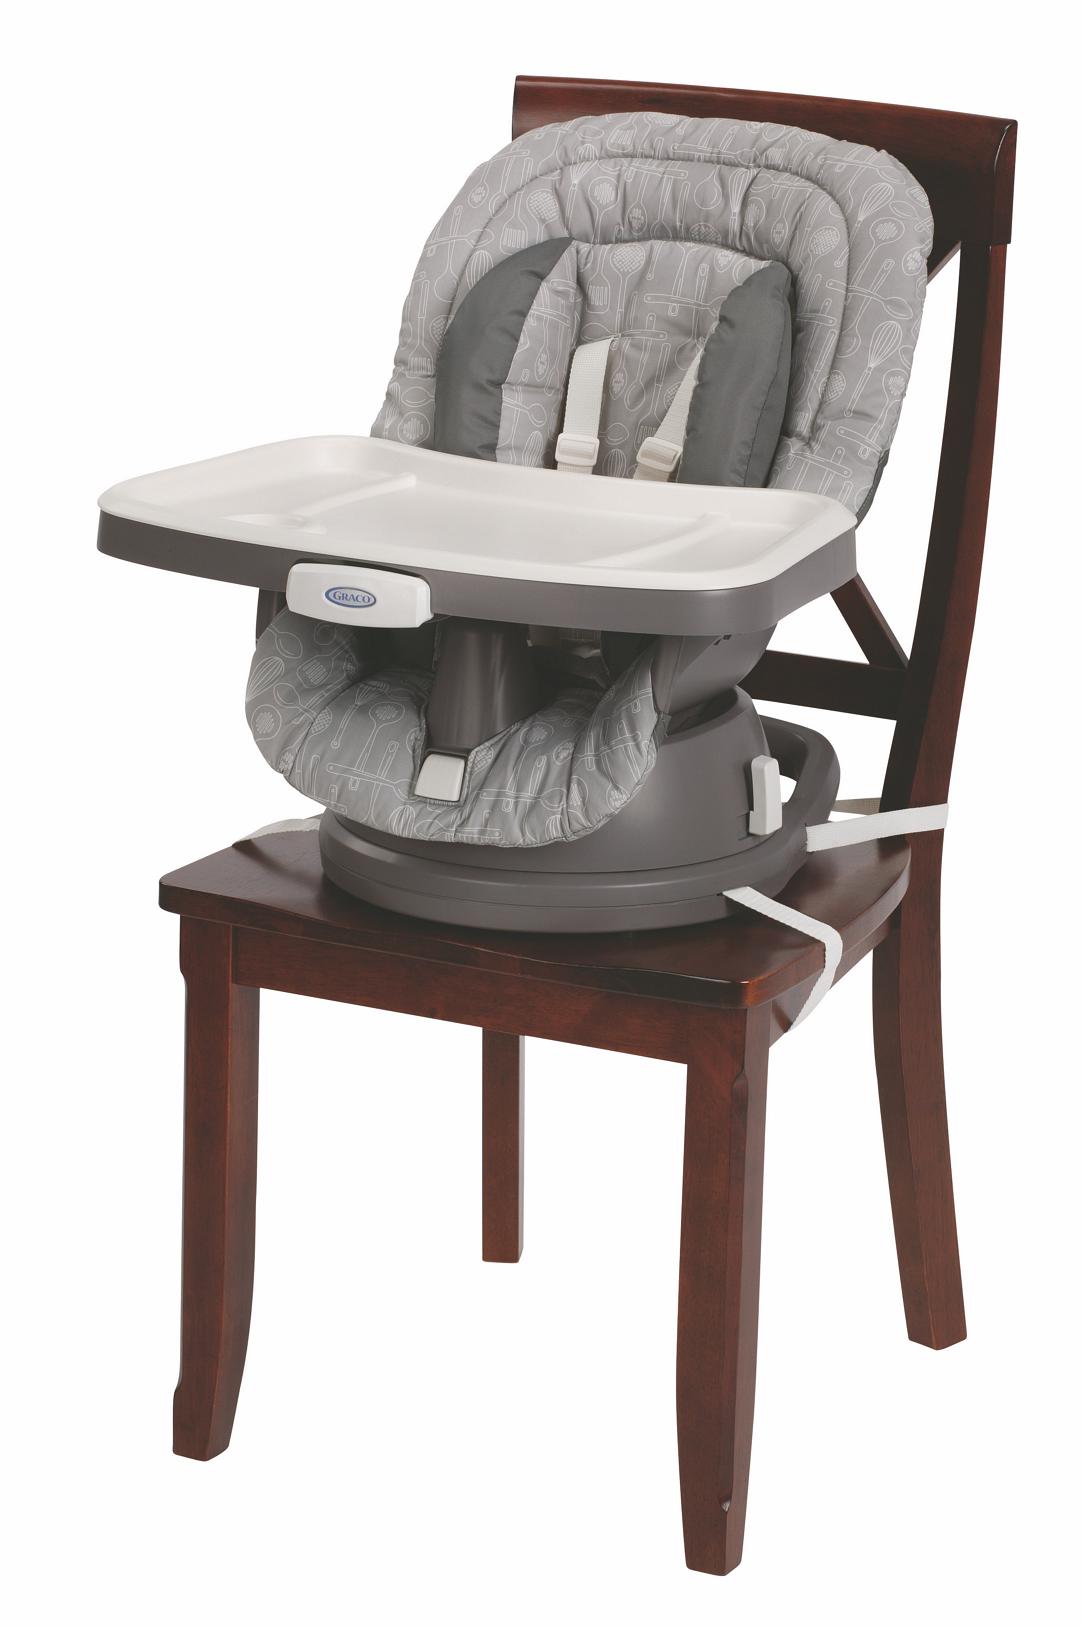 Amazon Com Graco Swivi Seat 3 In 1 Booster High Chair